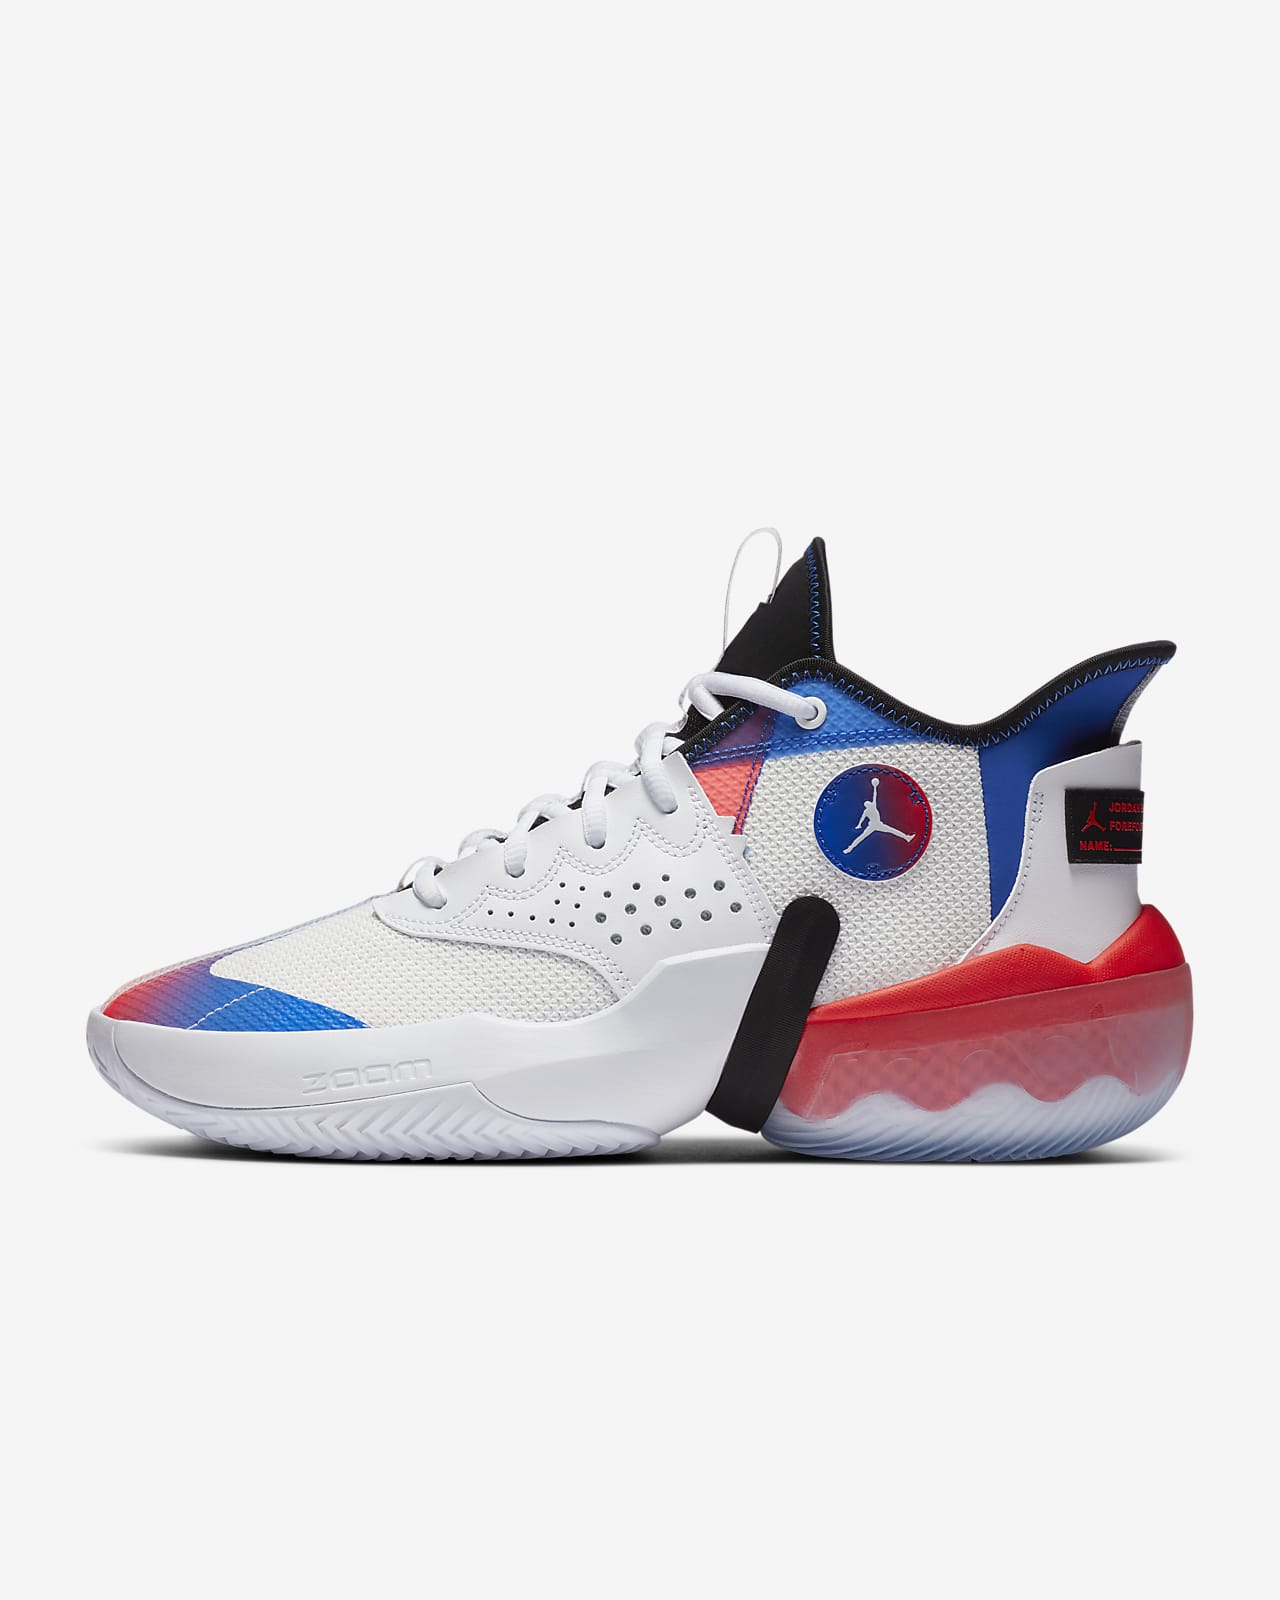 Sapatilhas de basquetebol Jordan React Elevation para homem